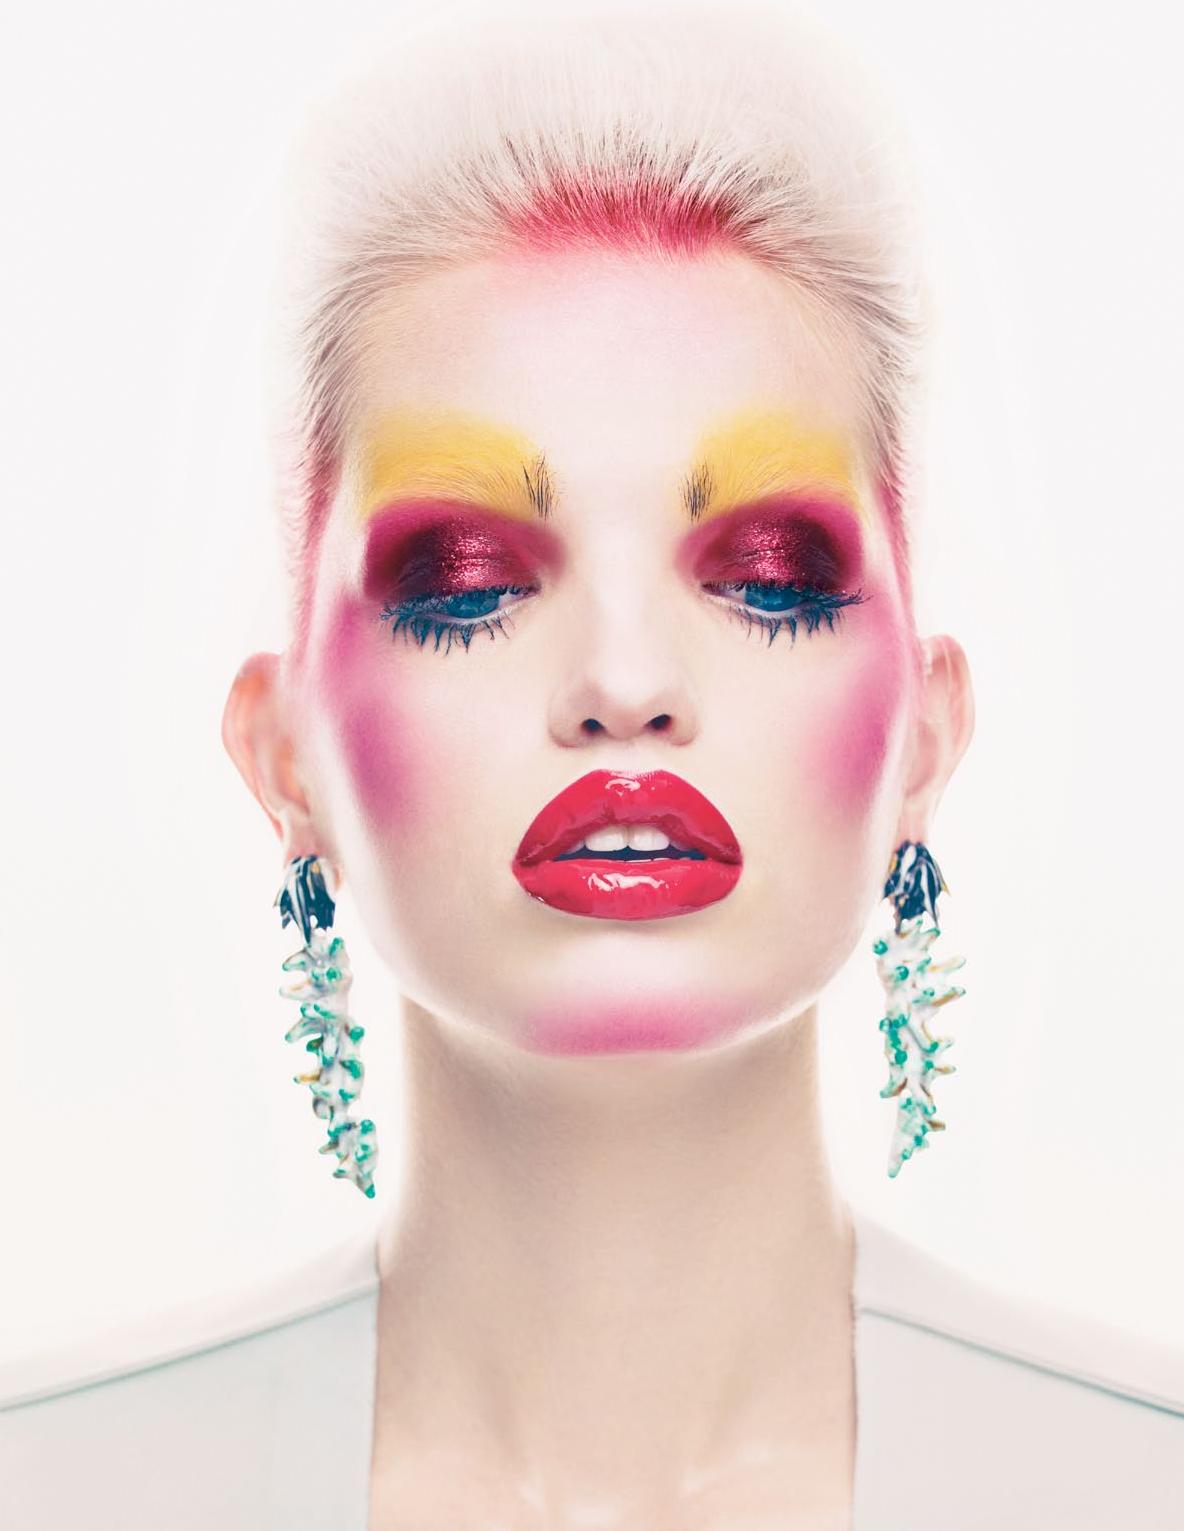 daphne groeneveld Fashion editorial makeup, Editorial